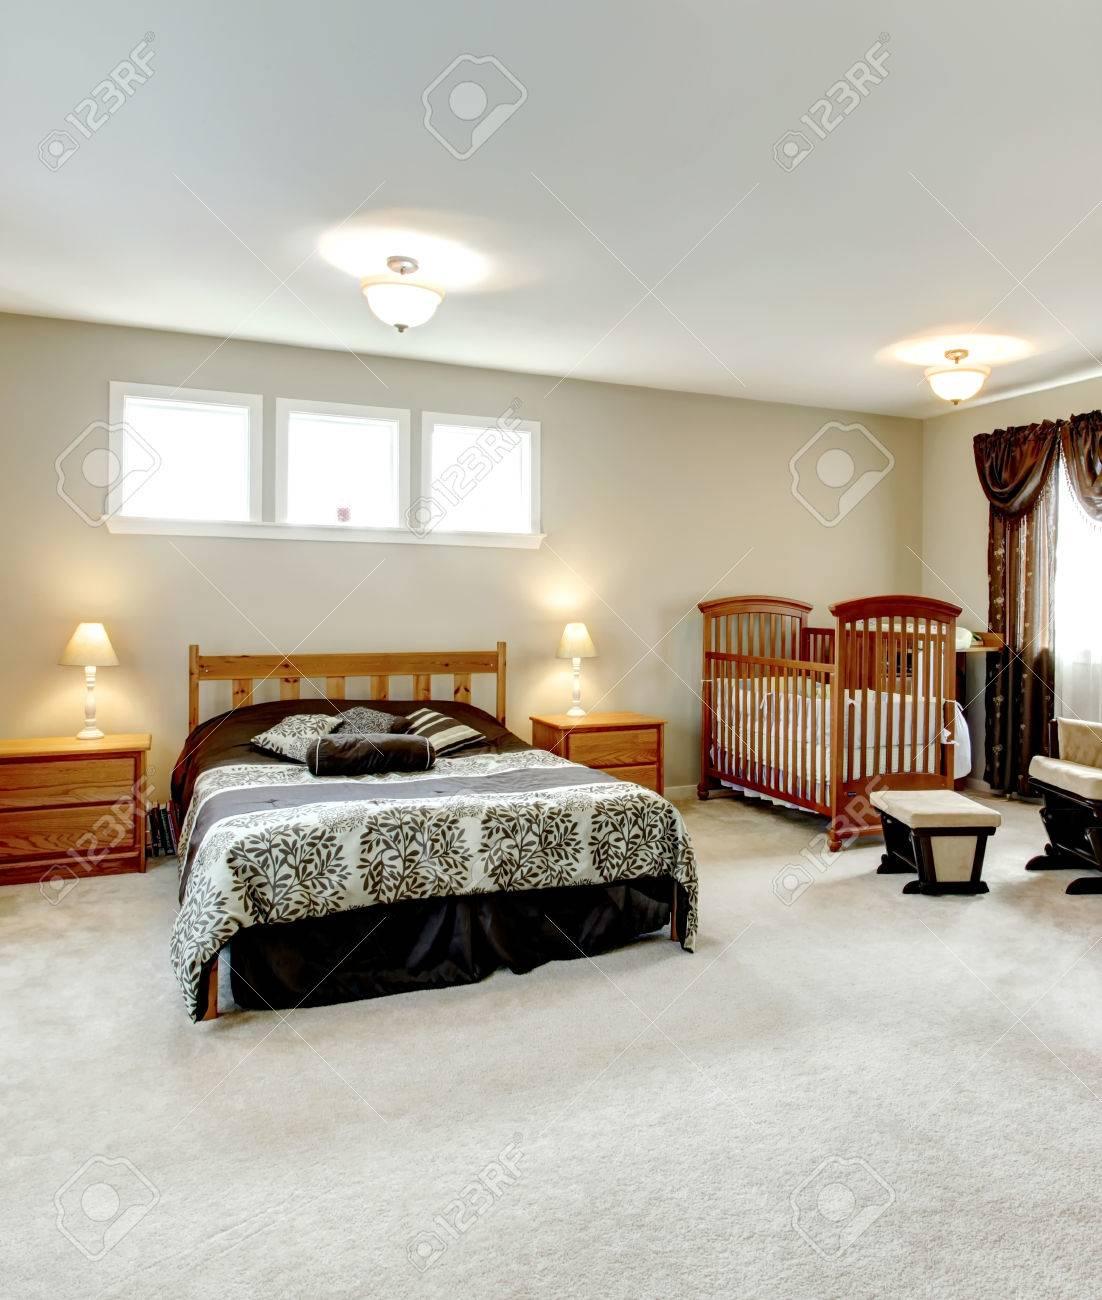 Big Master Bedroom With A Walk In Closet. Nursery Corner With A Crib.